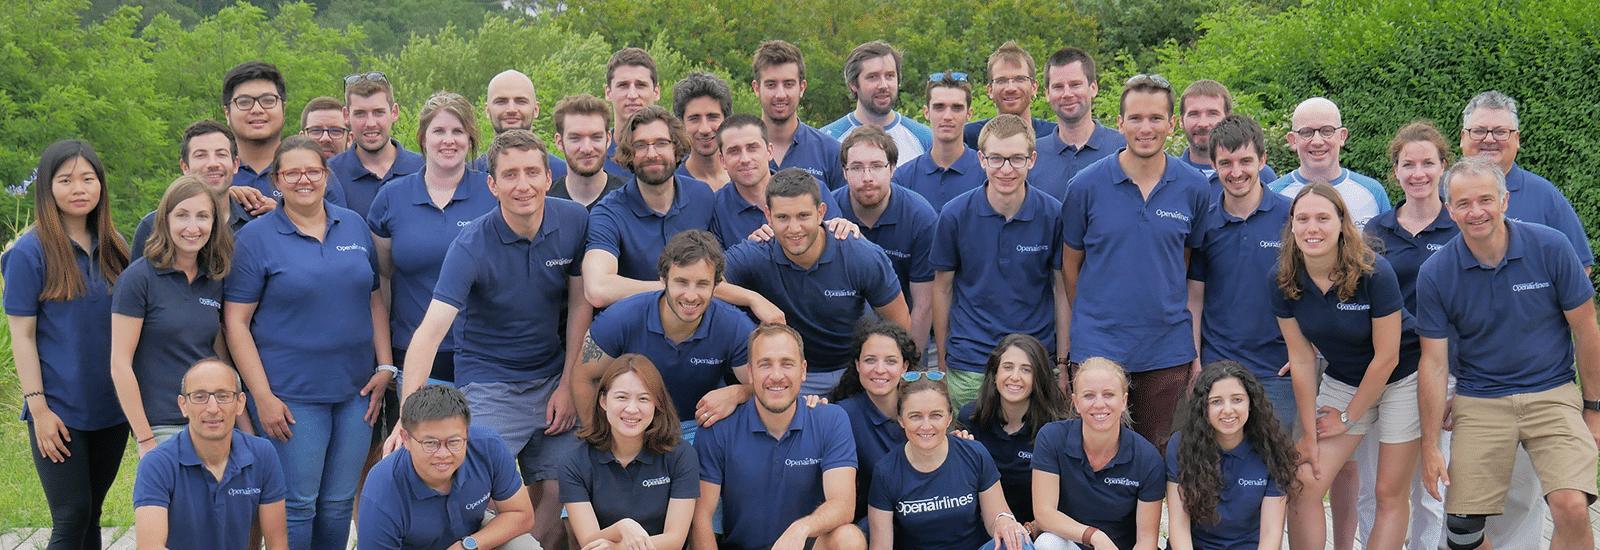 OpenAirlines team